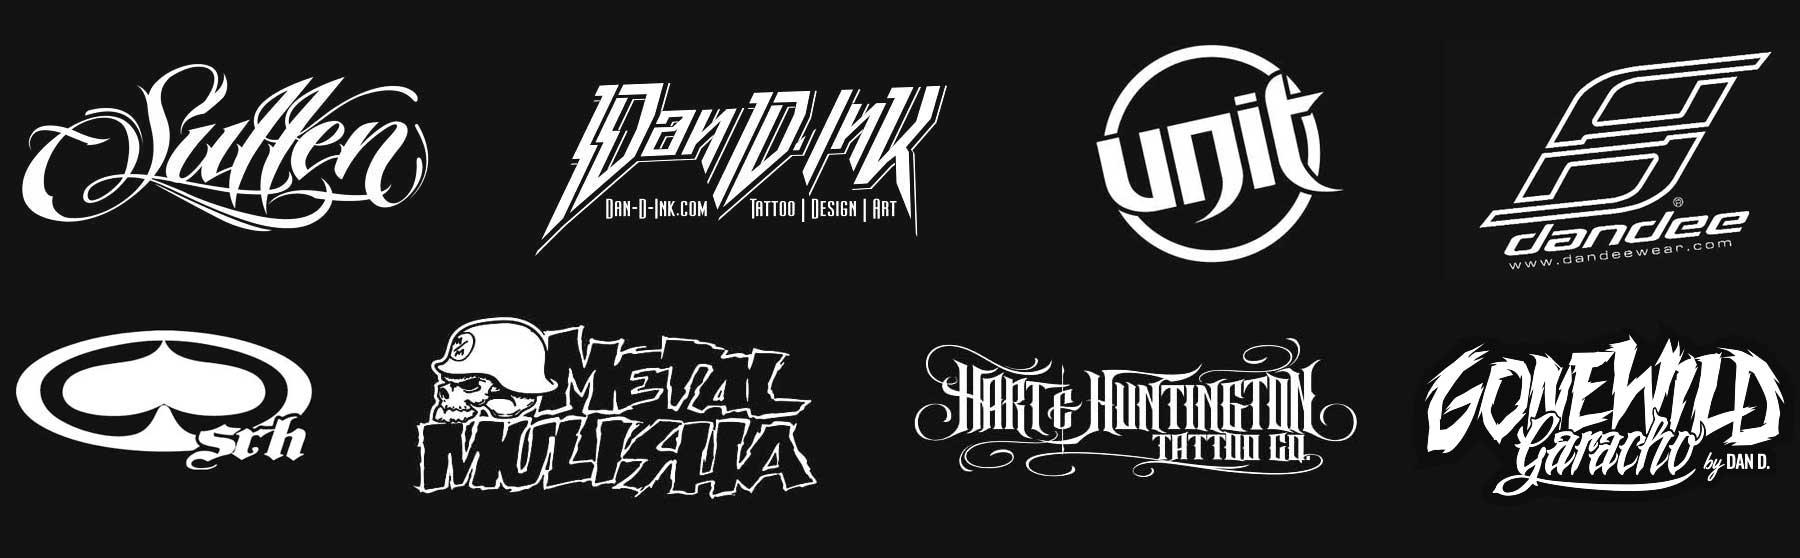 Sullen, Dan D. Ink, UNIT, Dandee, SRH, Metal Mulisha, Hurt & Huntington